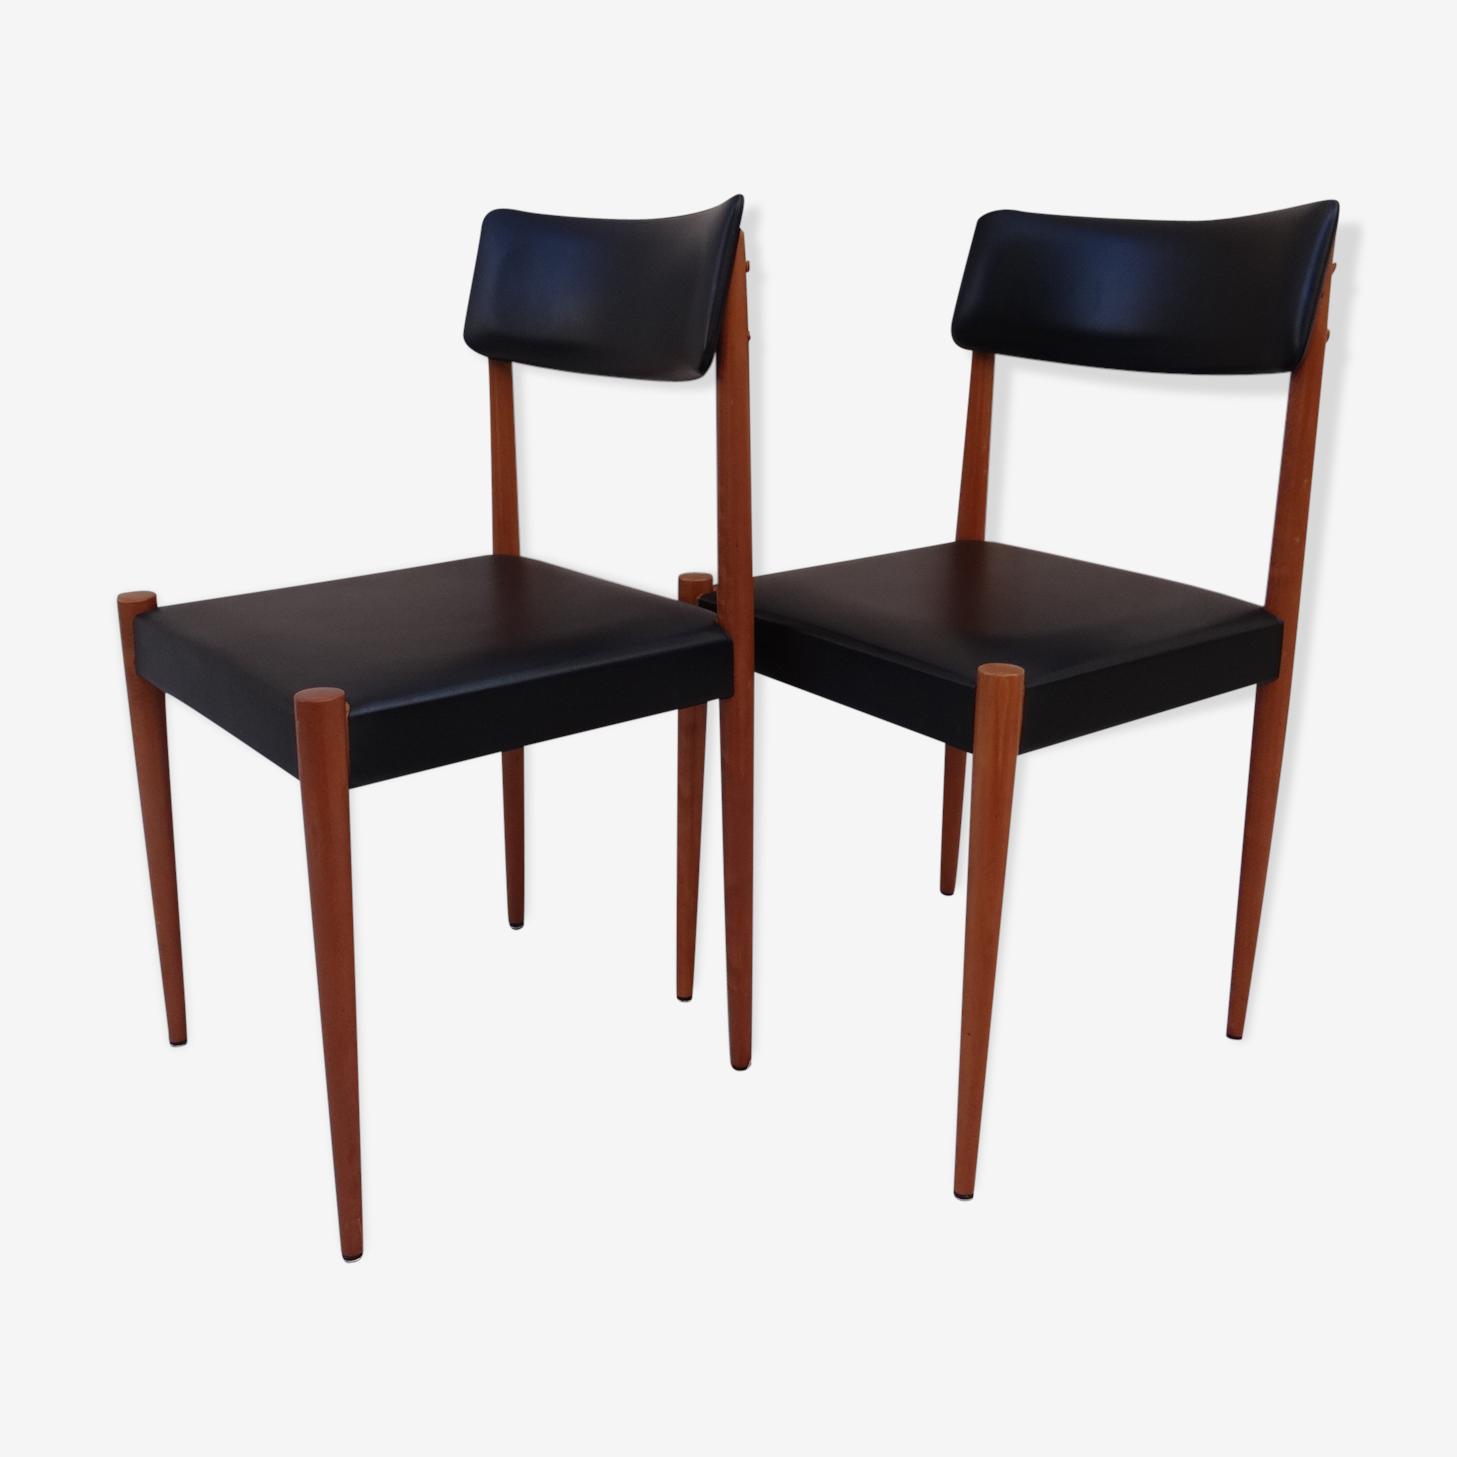 Scandinavian chairs 50/60